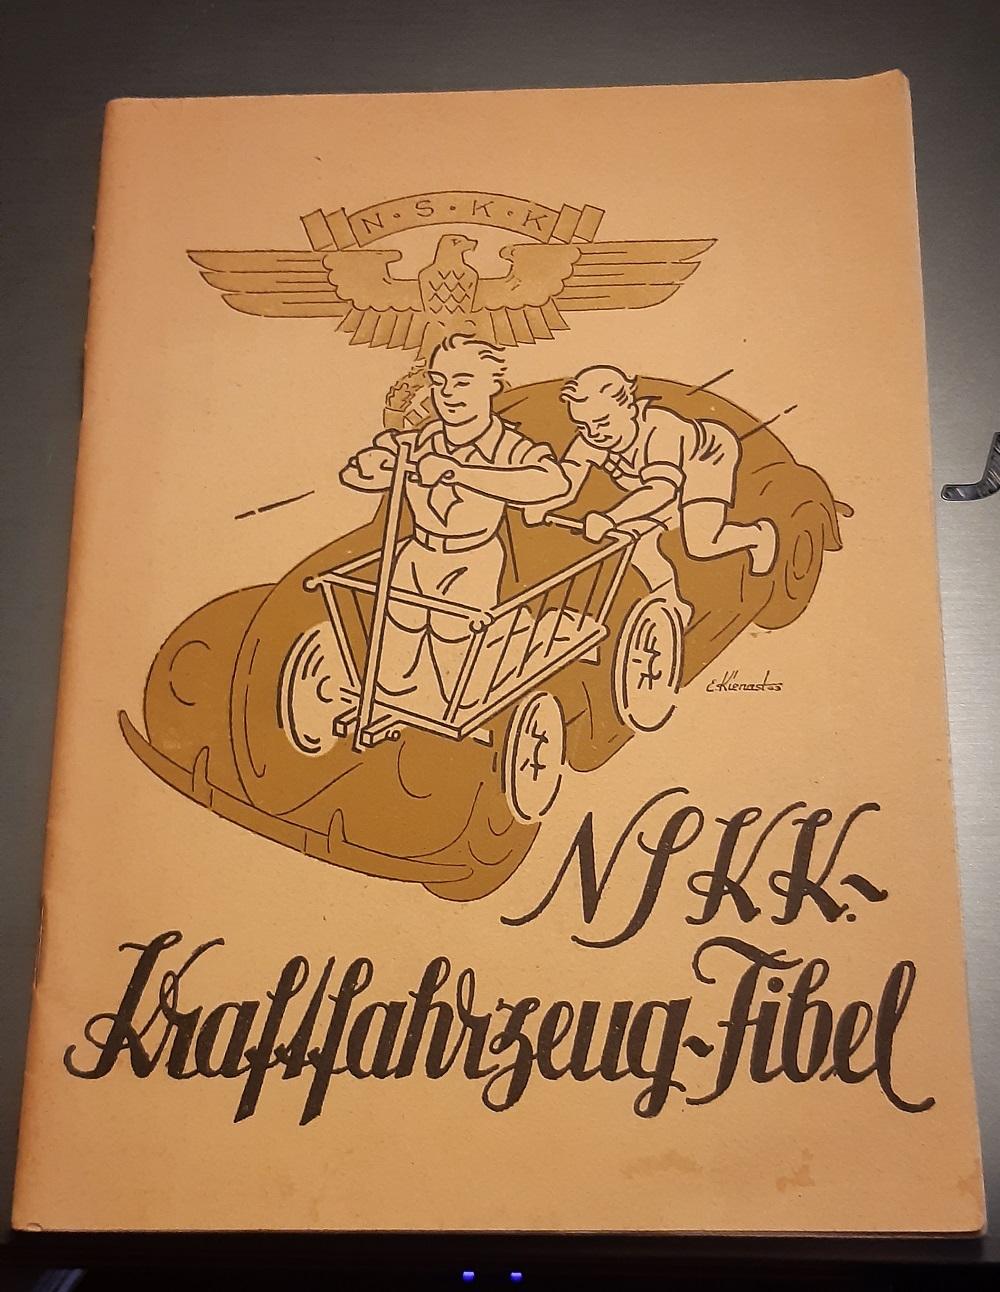 livre NSKK kraftfahrzeug fibel Nskk10